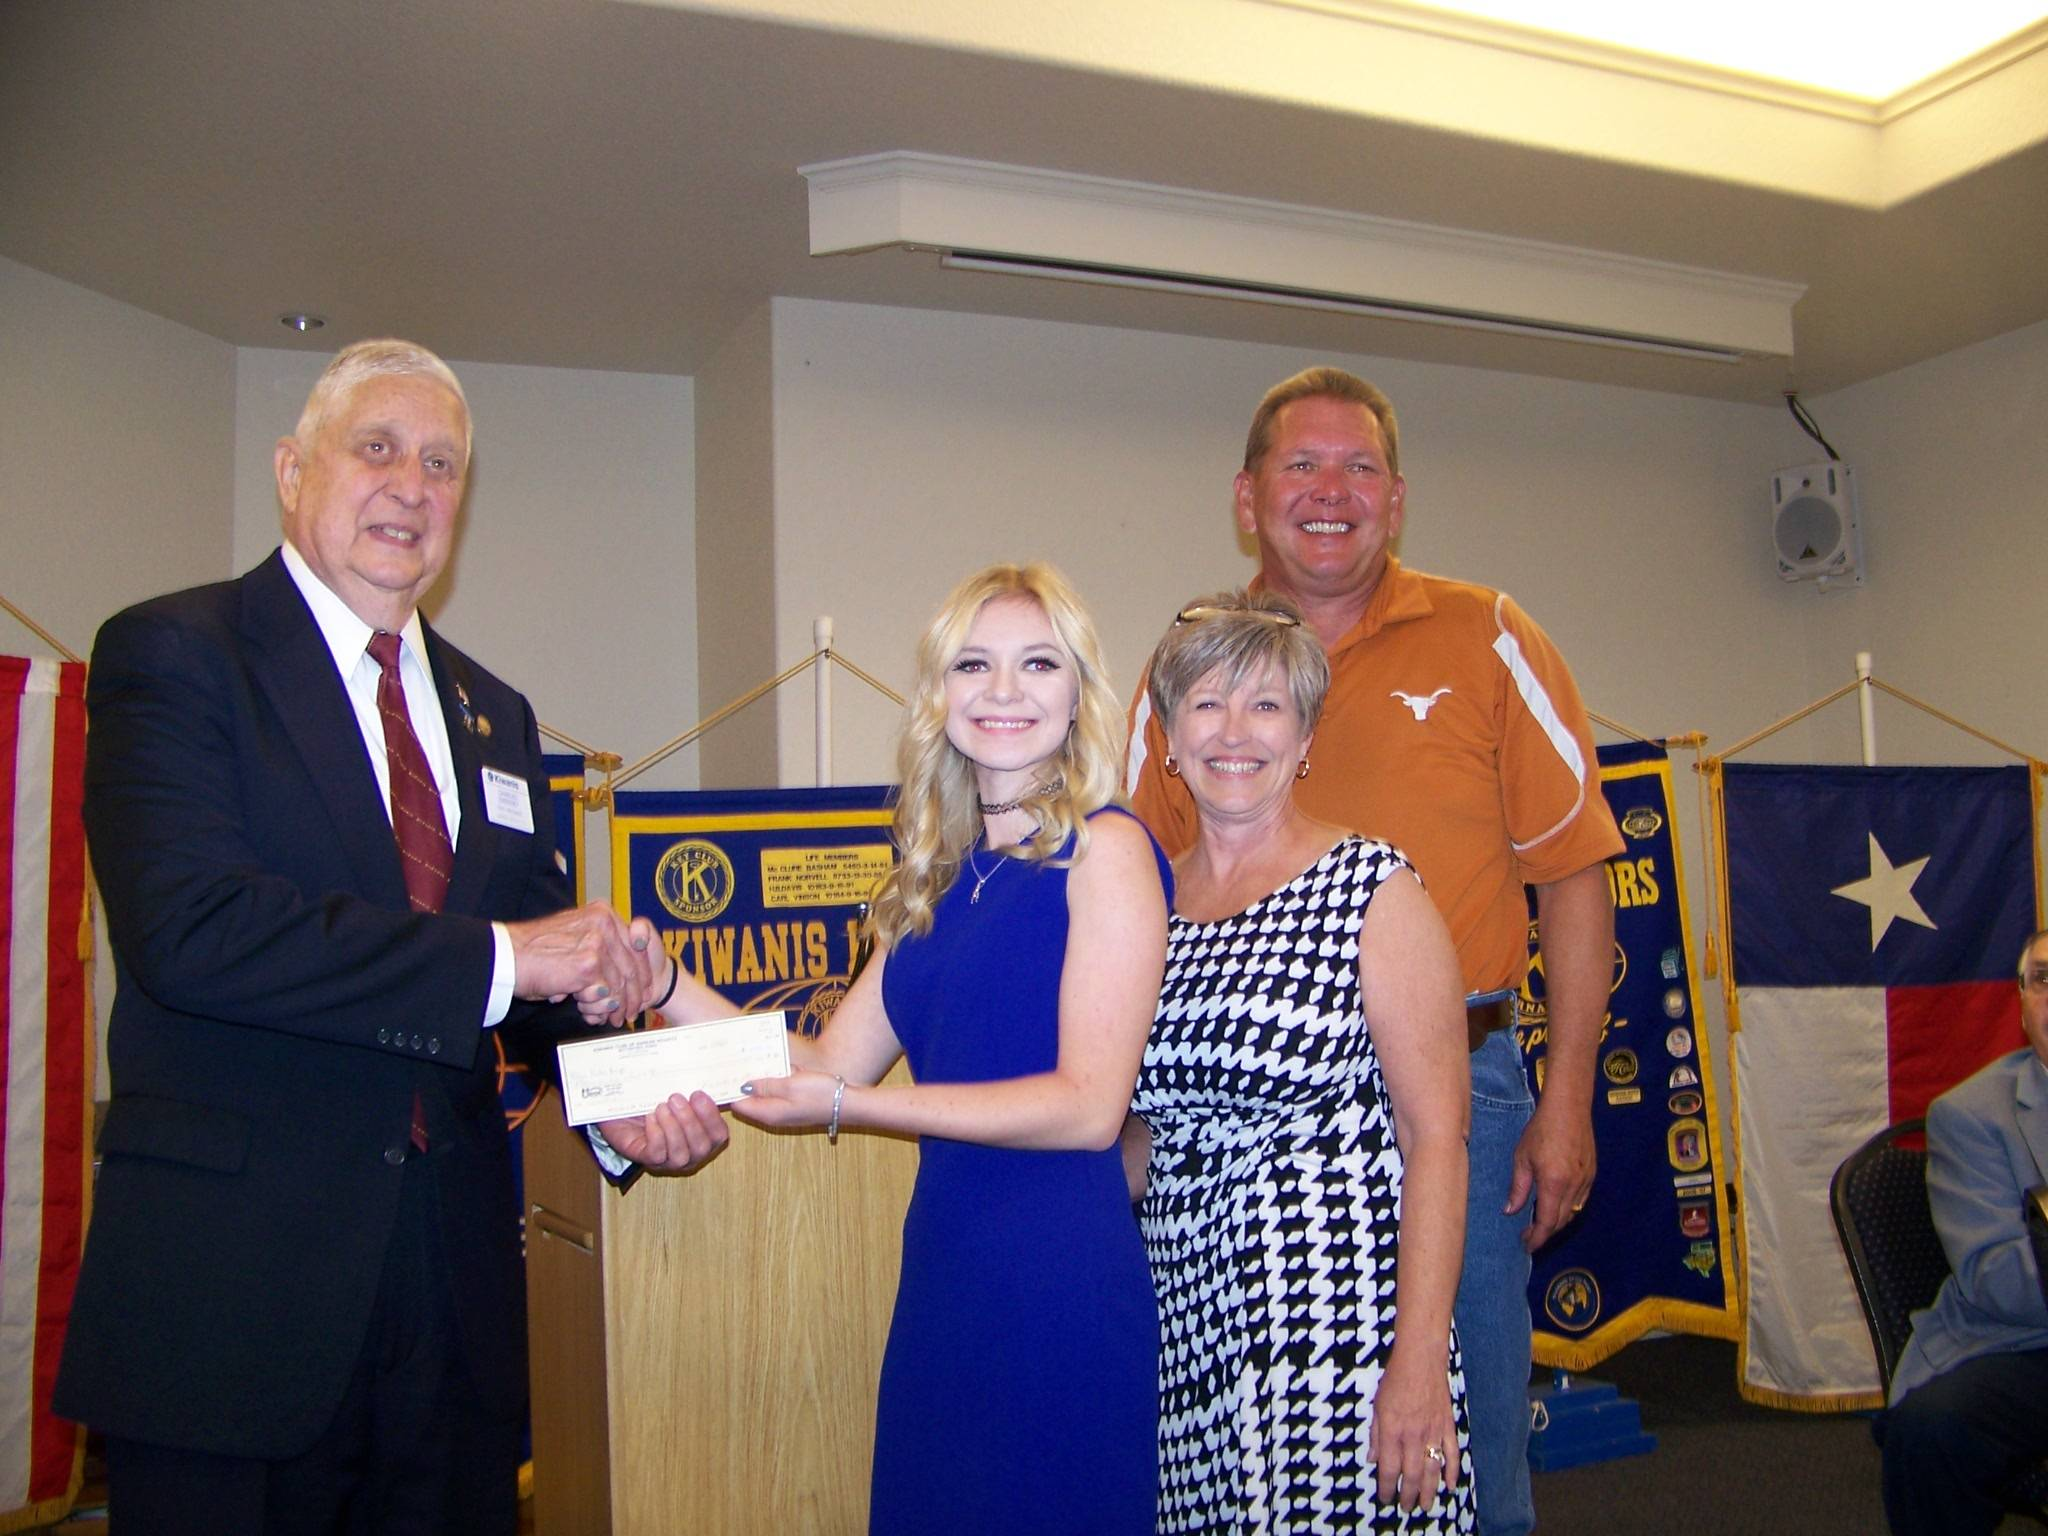 Haley Knapp & parents Bill & Lori Knapp